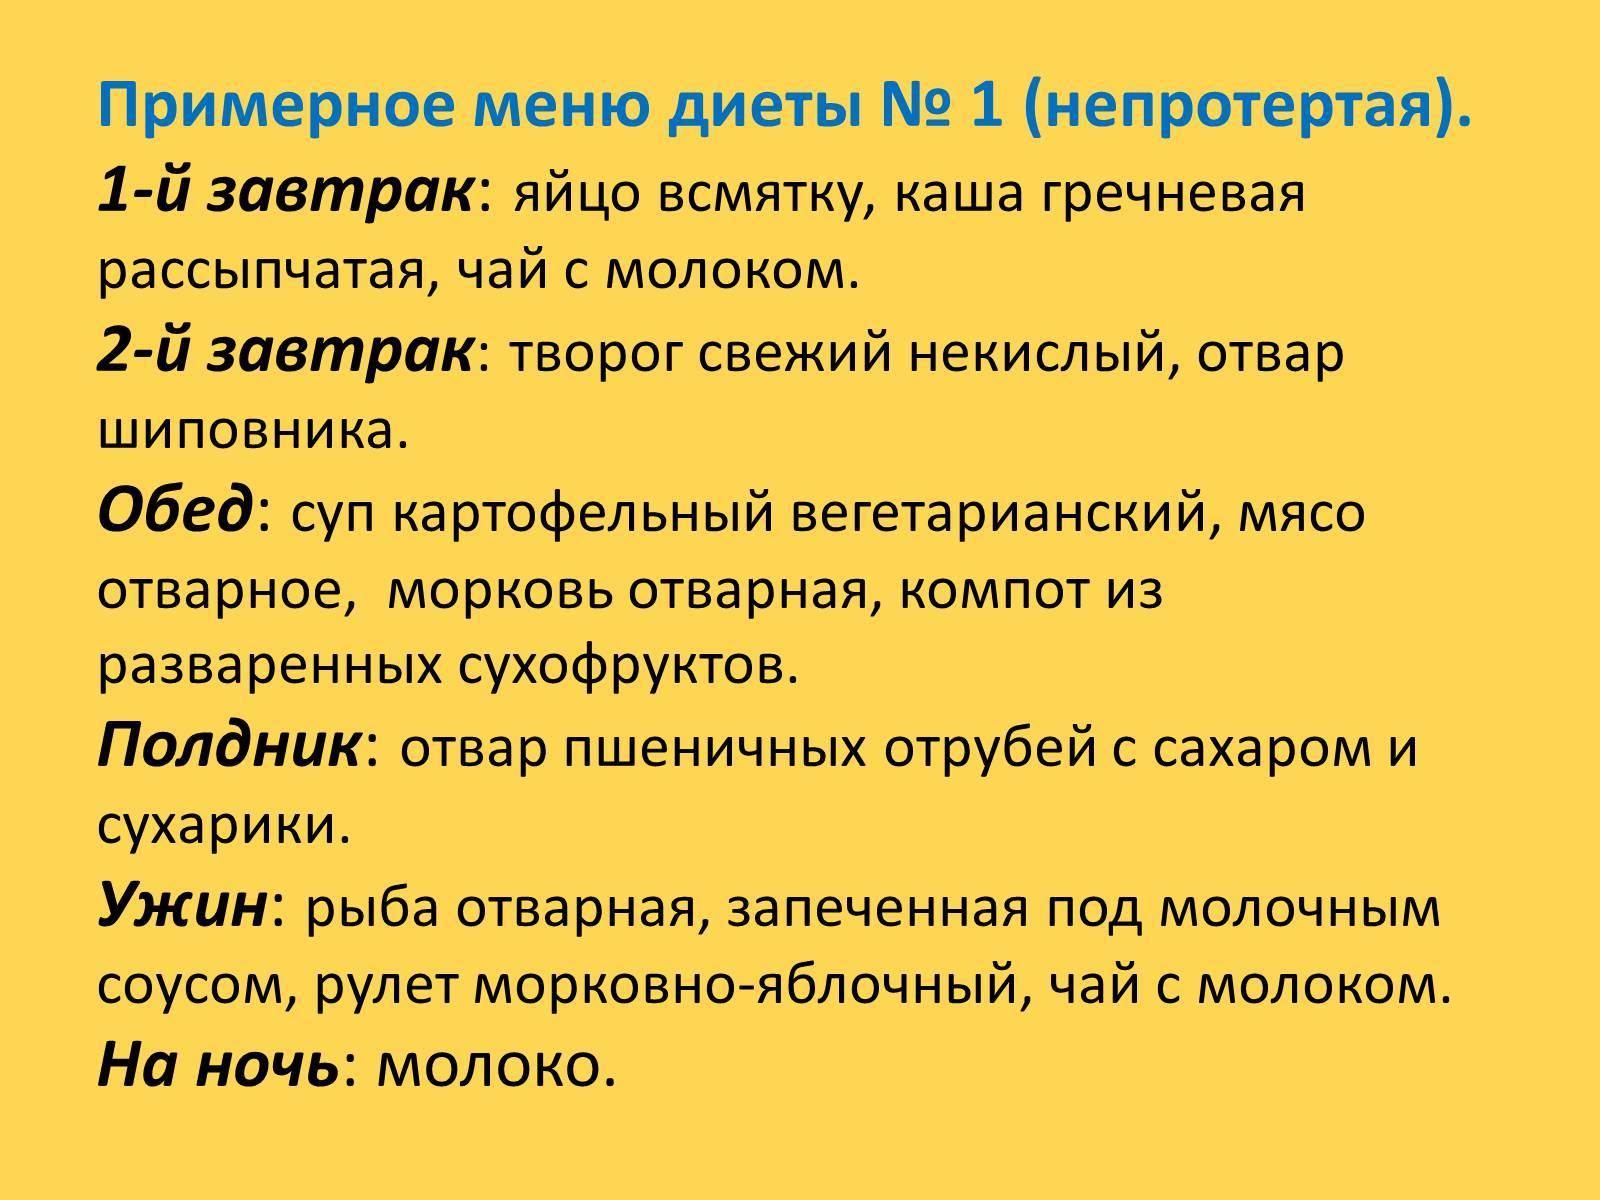 Диета Стол Номер Один По Певзнеру